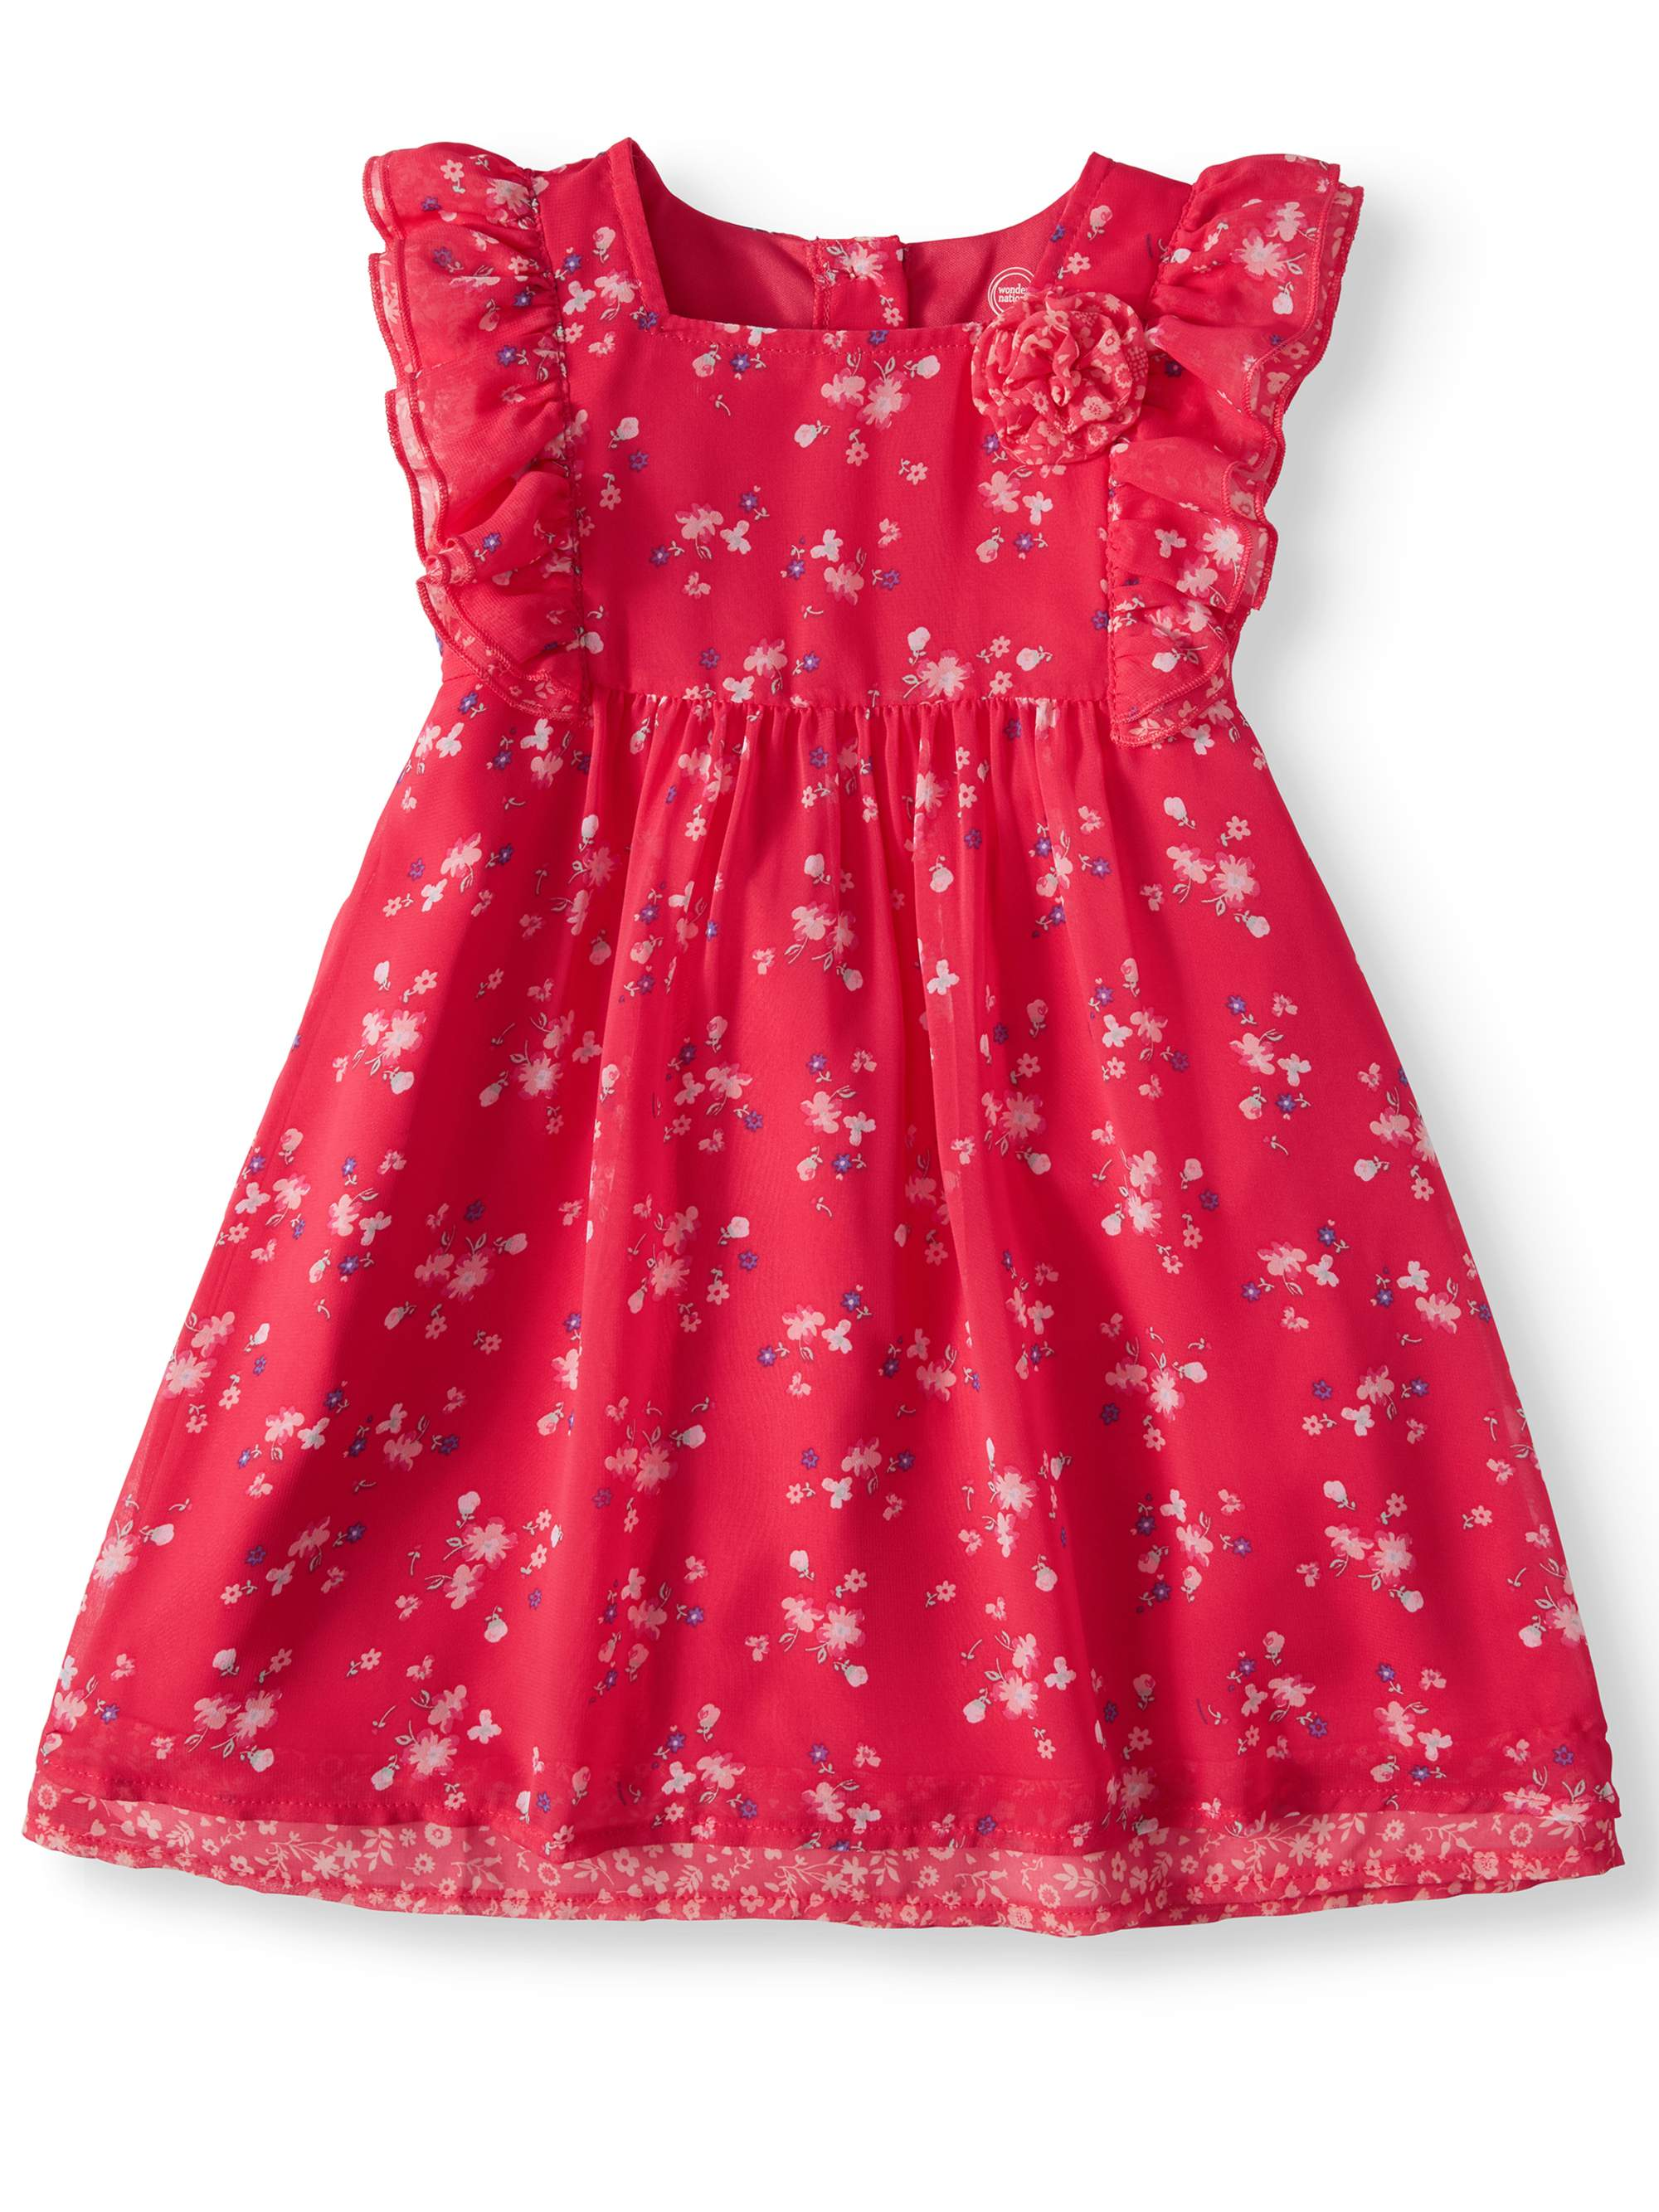 Ruffle Sleeve Patterned Dress (Toddler Girls)